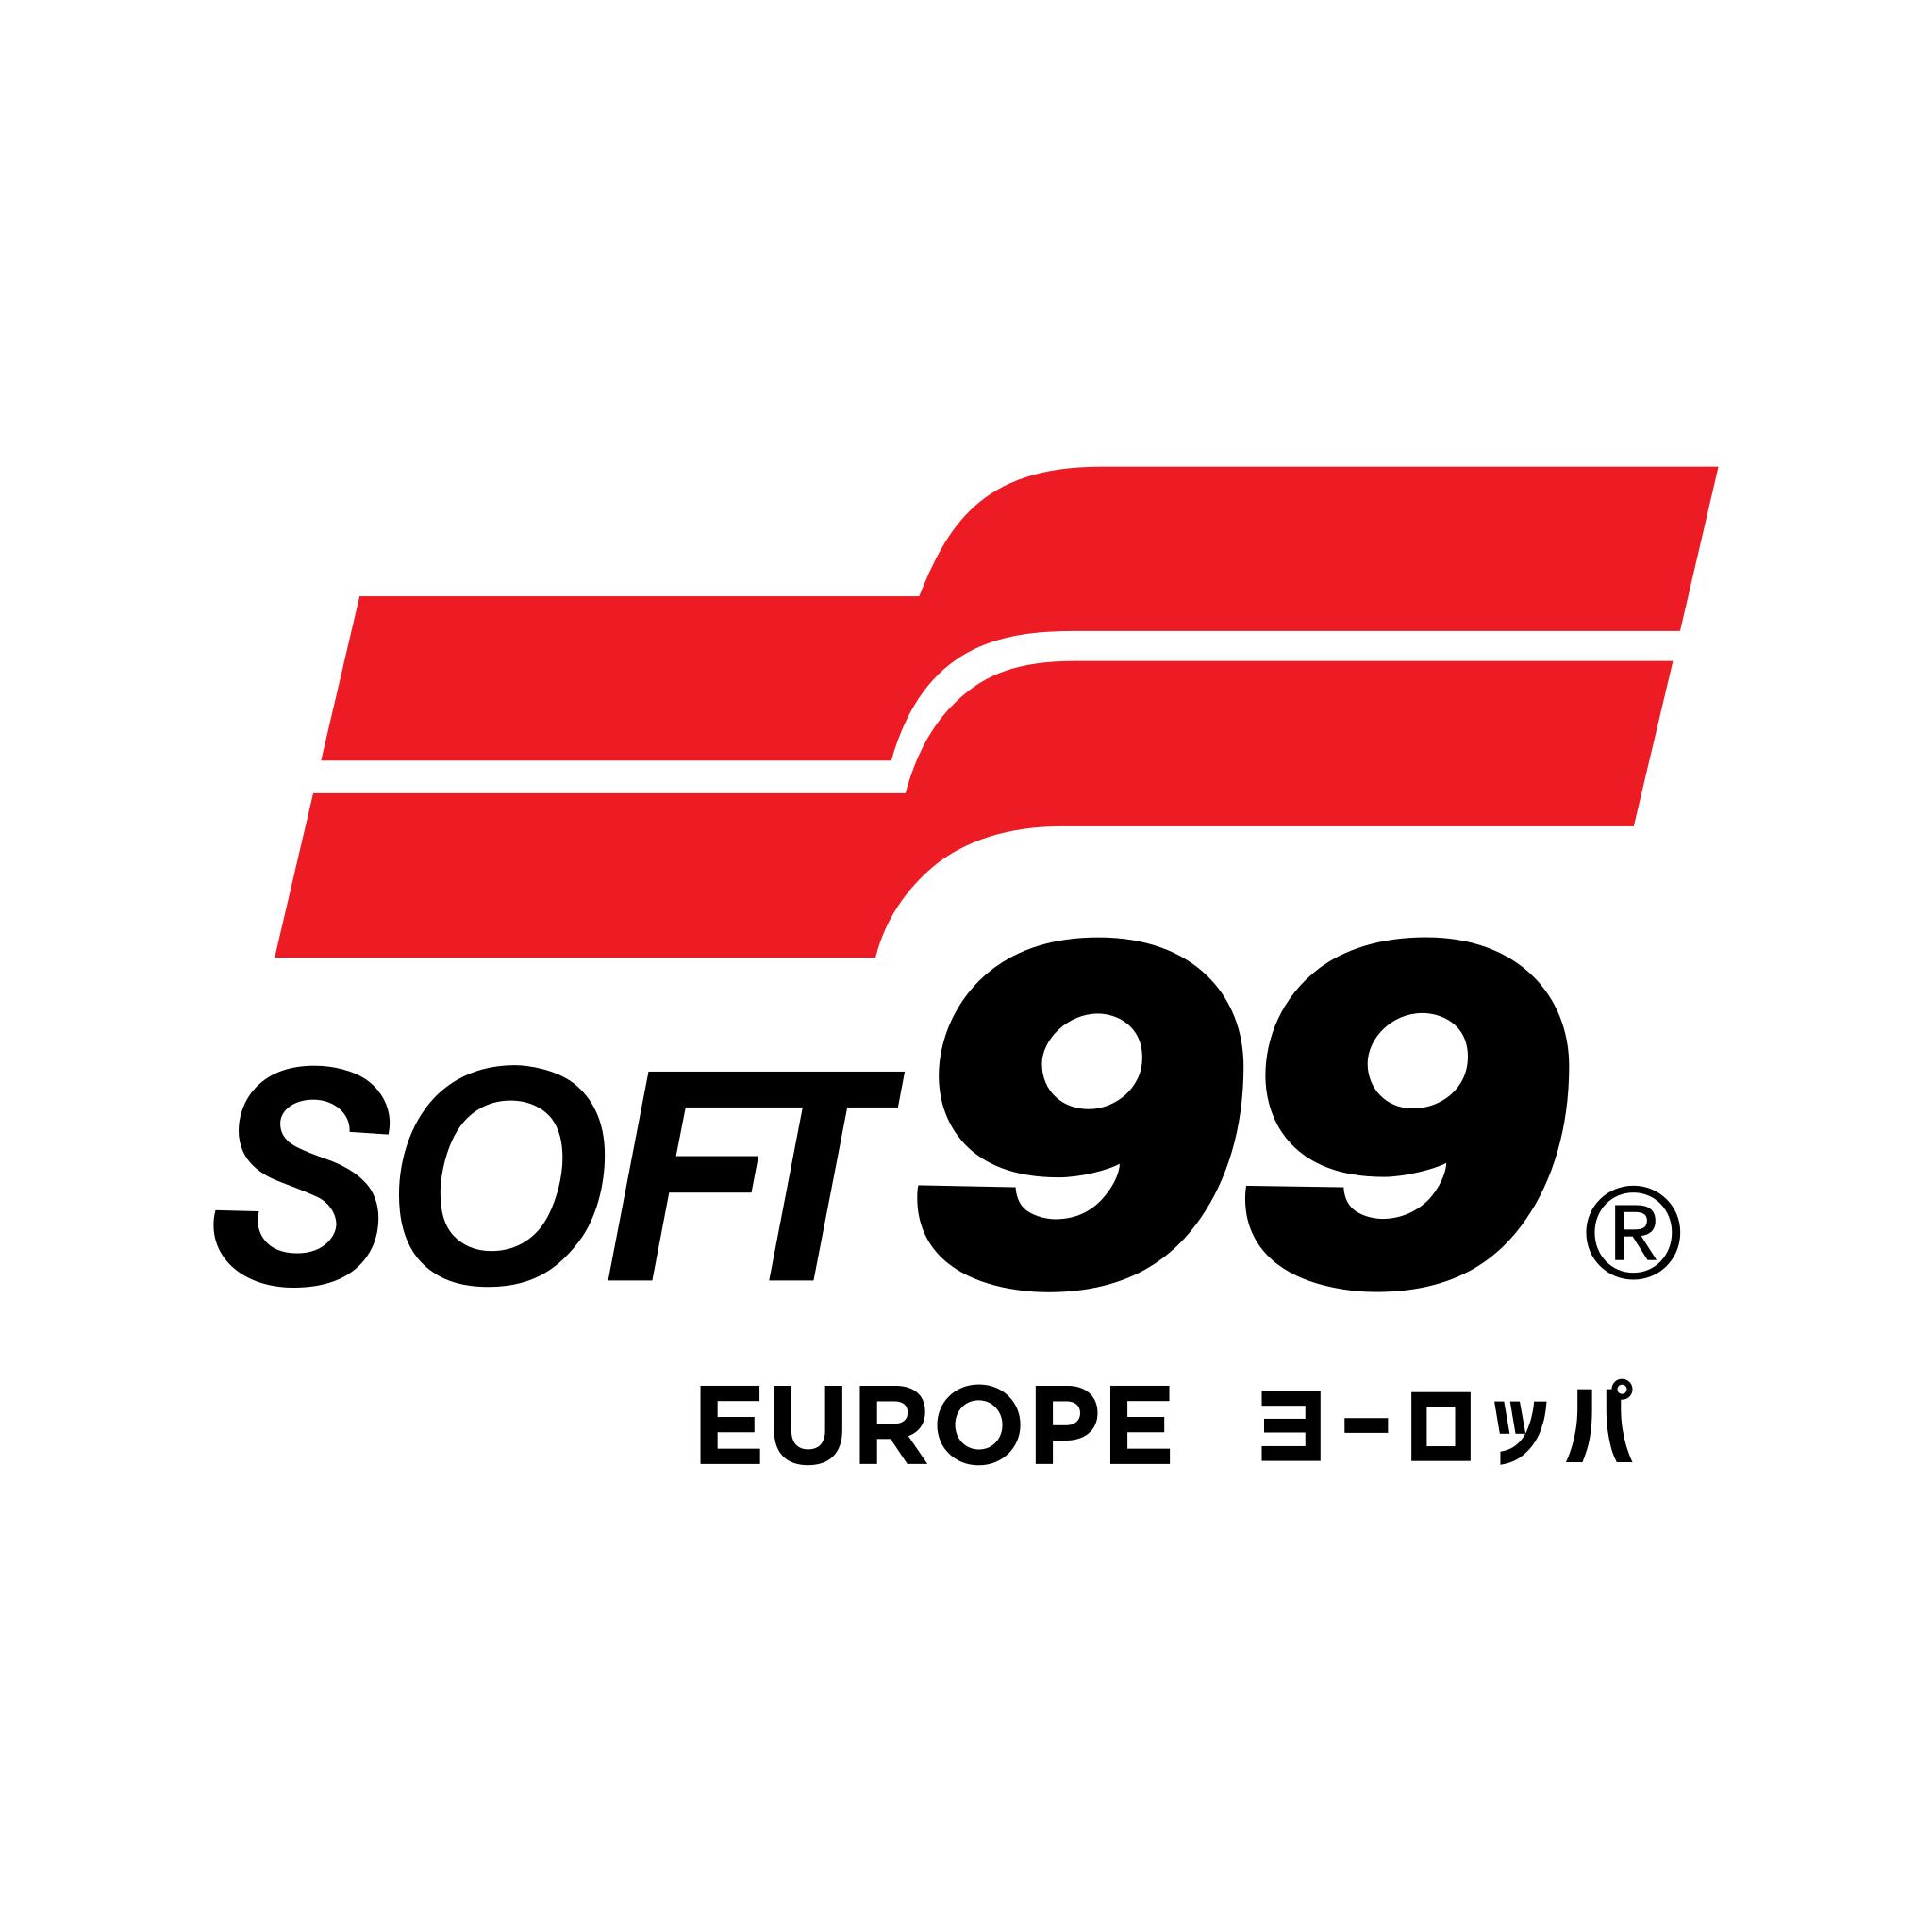 Soft99 Optyka